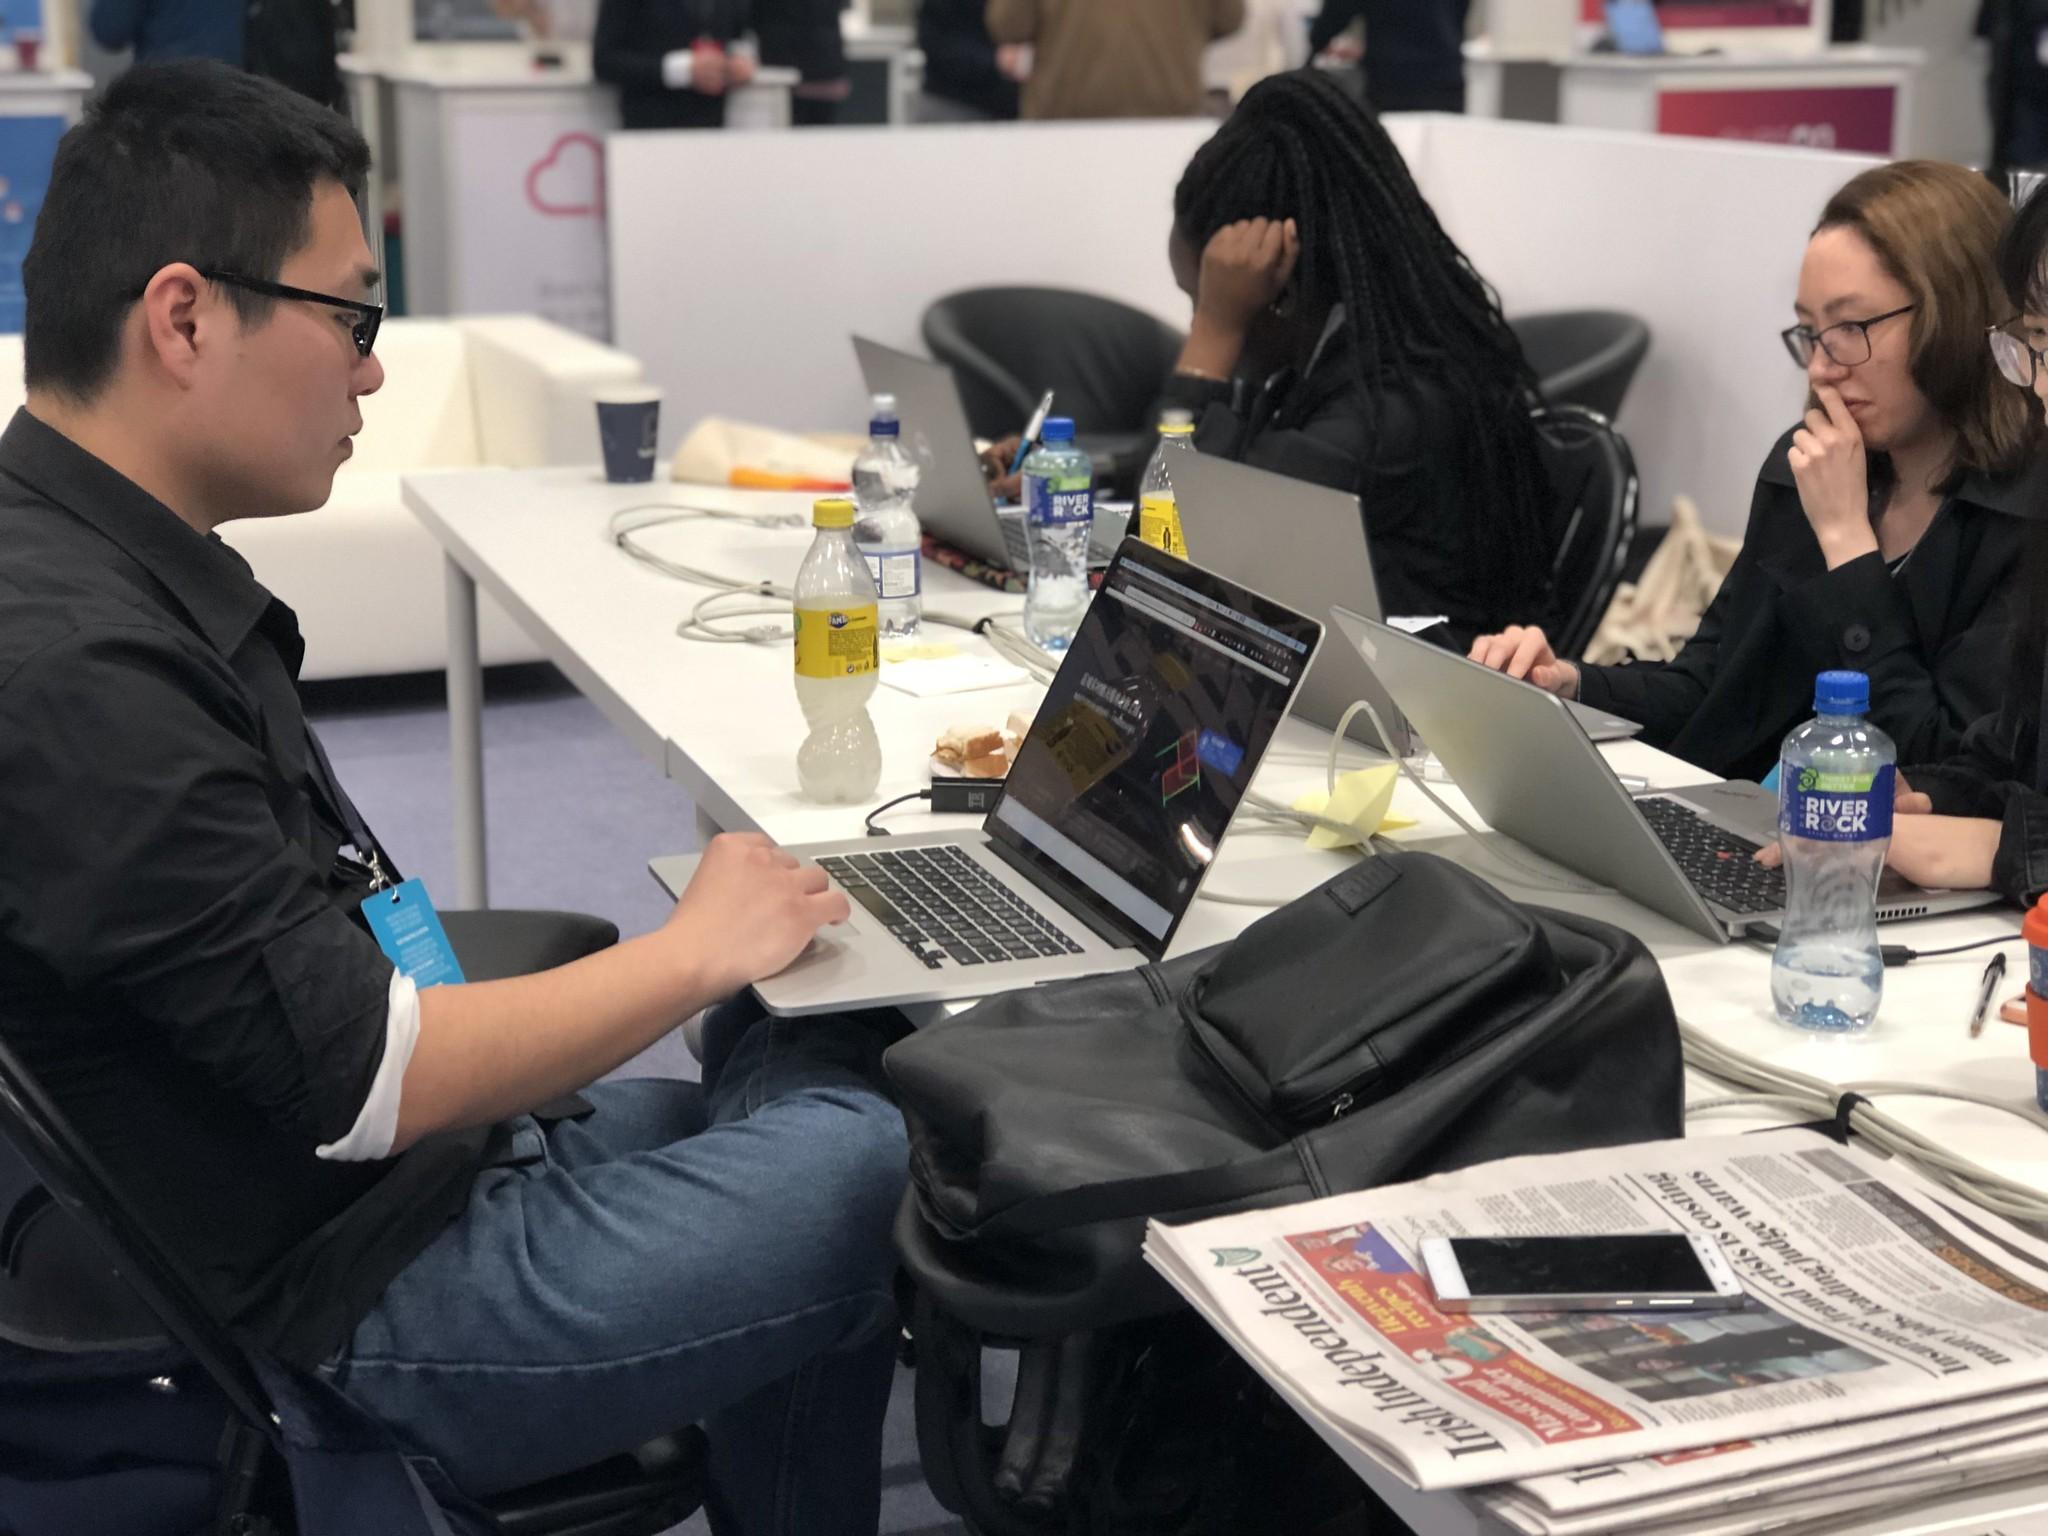 5 Essential Digital Design Tricks for Hackathon Projects